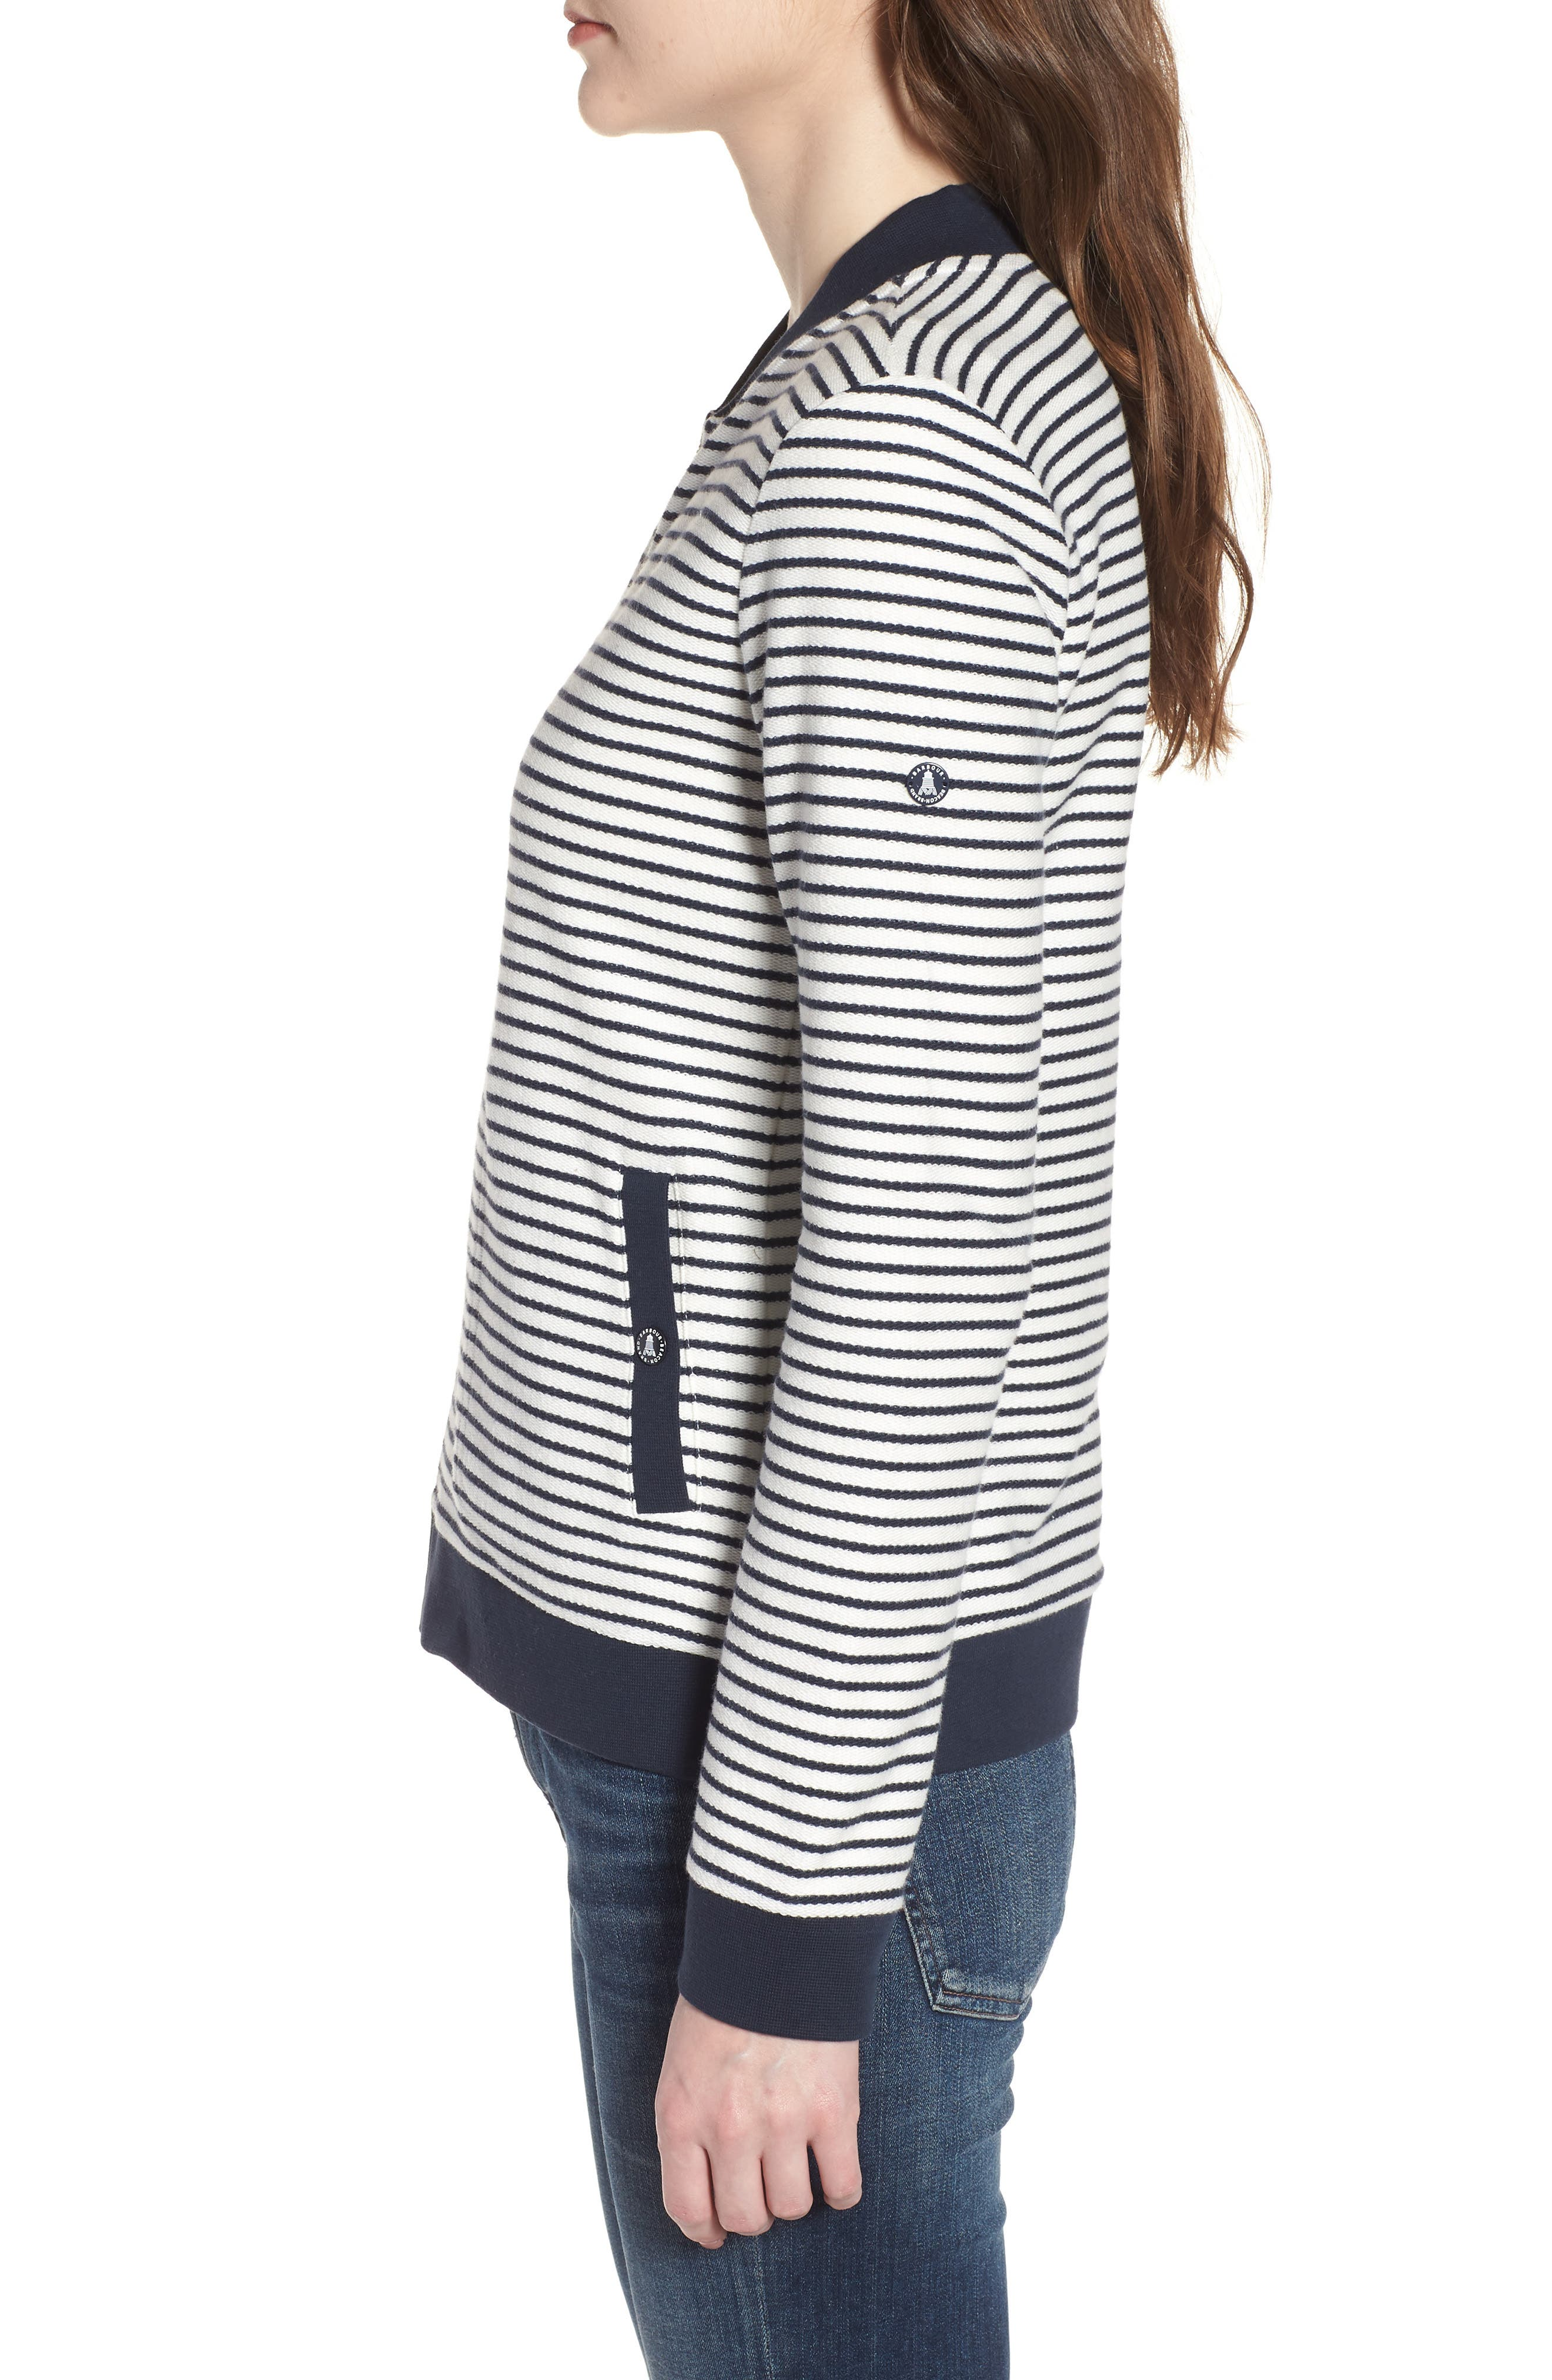 Bamburgh Sweater Jacket,                             Alternate thumbnail 3, color,                             White/ Navy